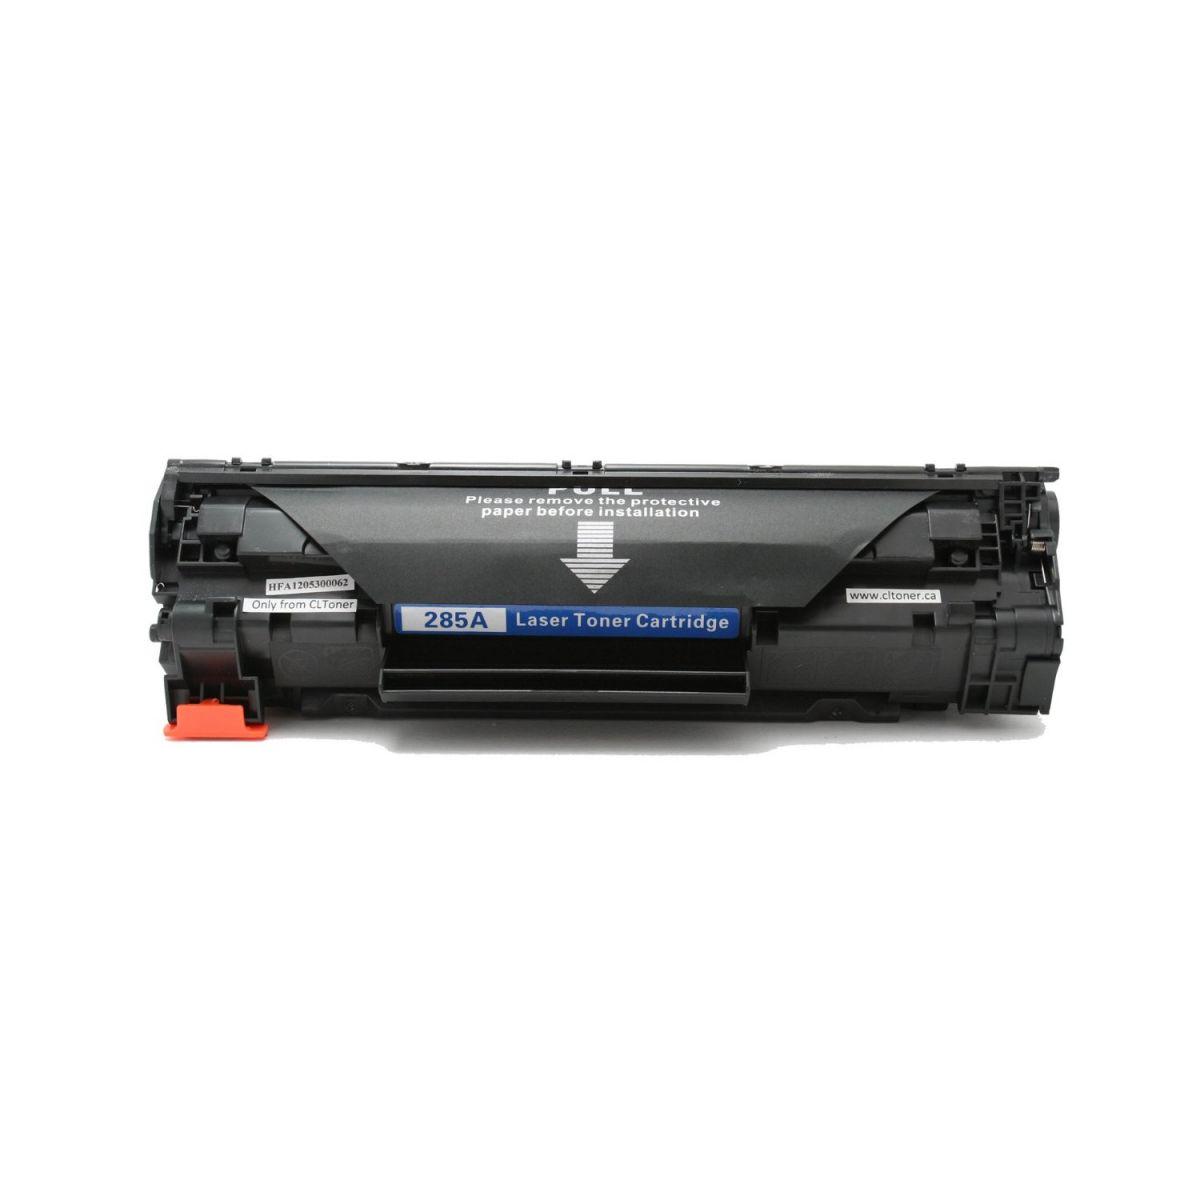 Toner Multilaser Compatível HP Ce285a CB436 e CB435A Para Impressoras P1100 P1102w 1005 P1006 P1505 M1120 M1522n M1132 M1210 M1212 M1214 M1217